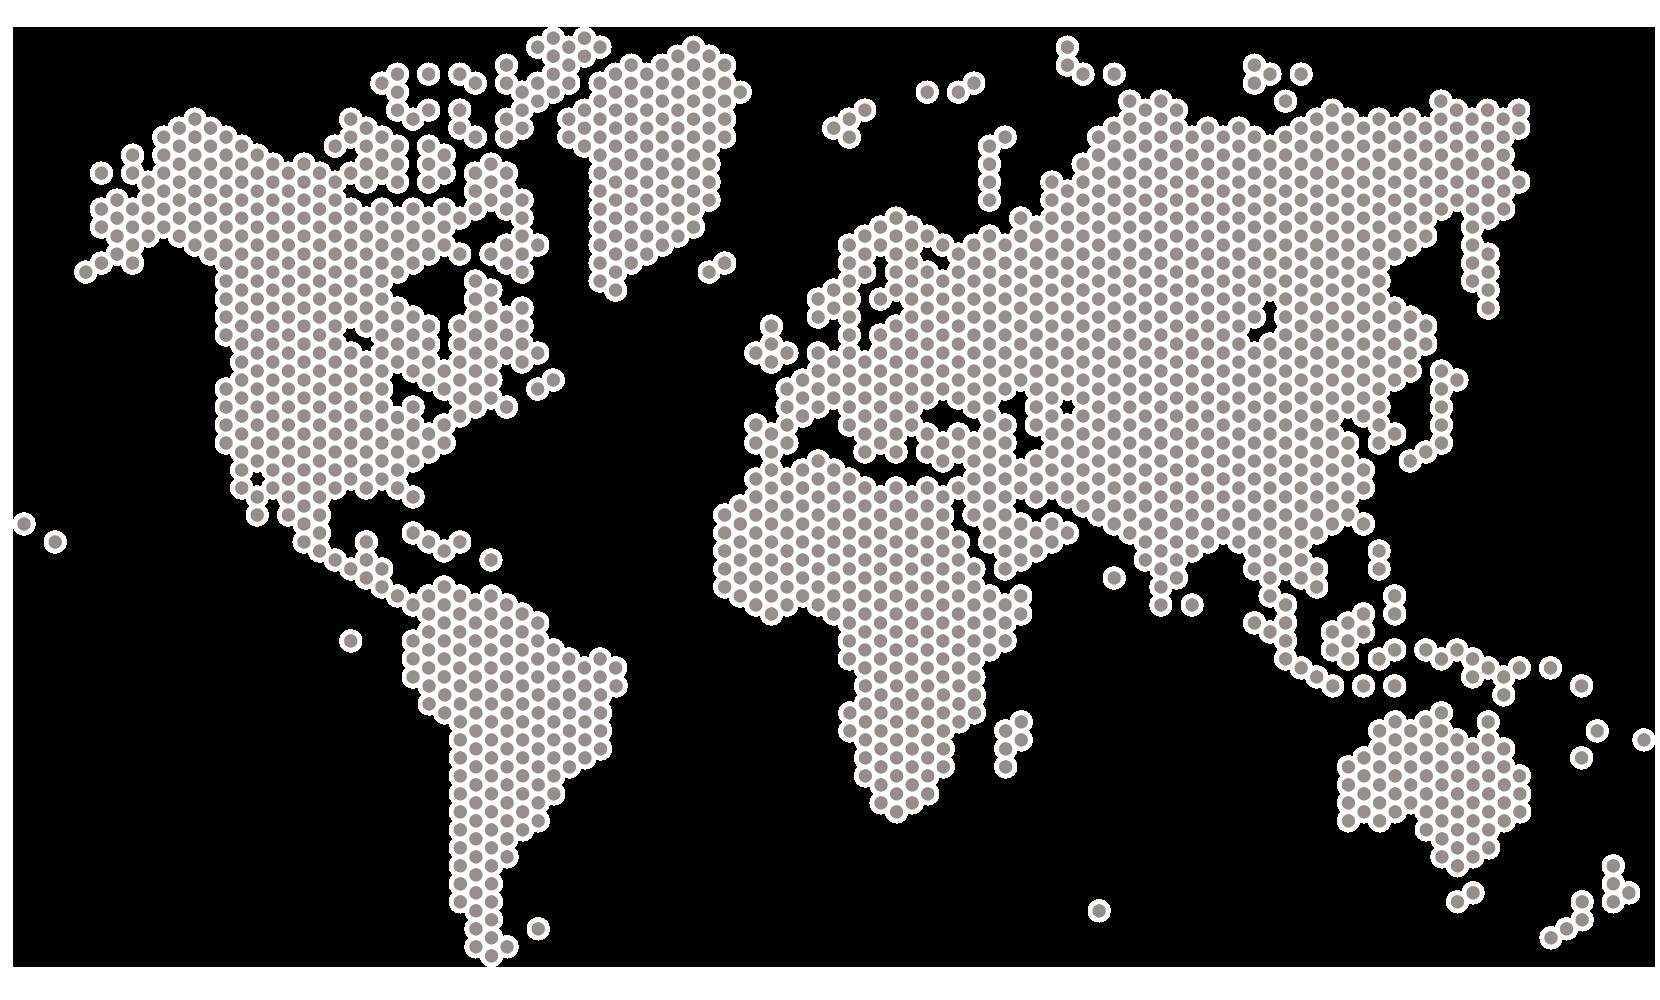 lg ads office world map